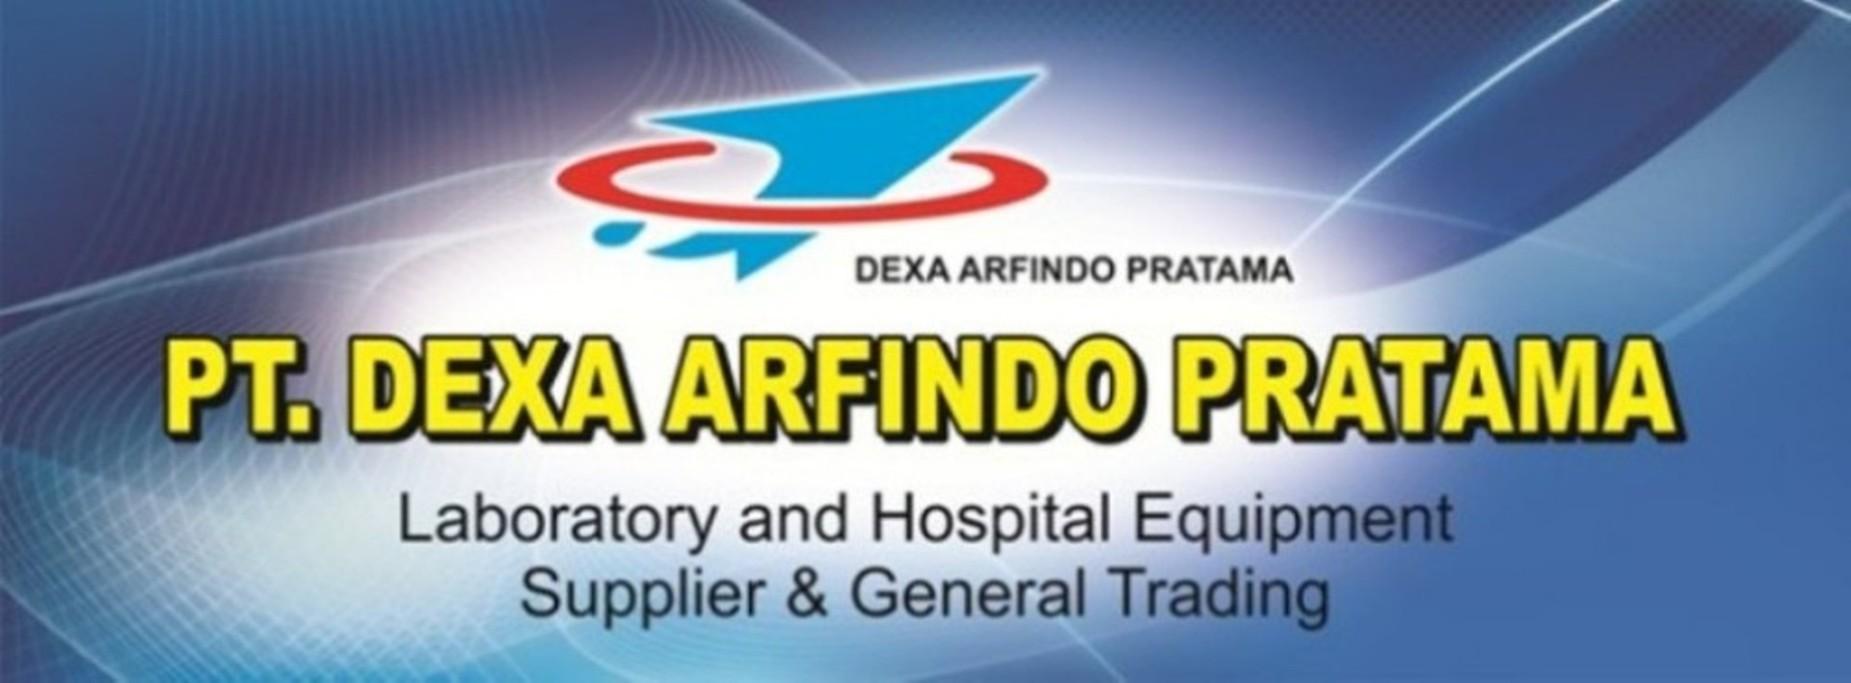 PT. DEXA ARFINDO PRATAMA